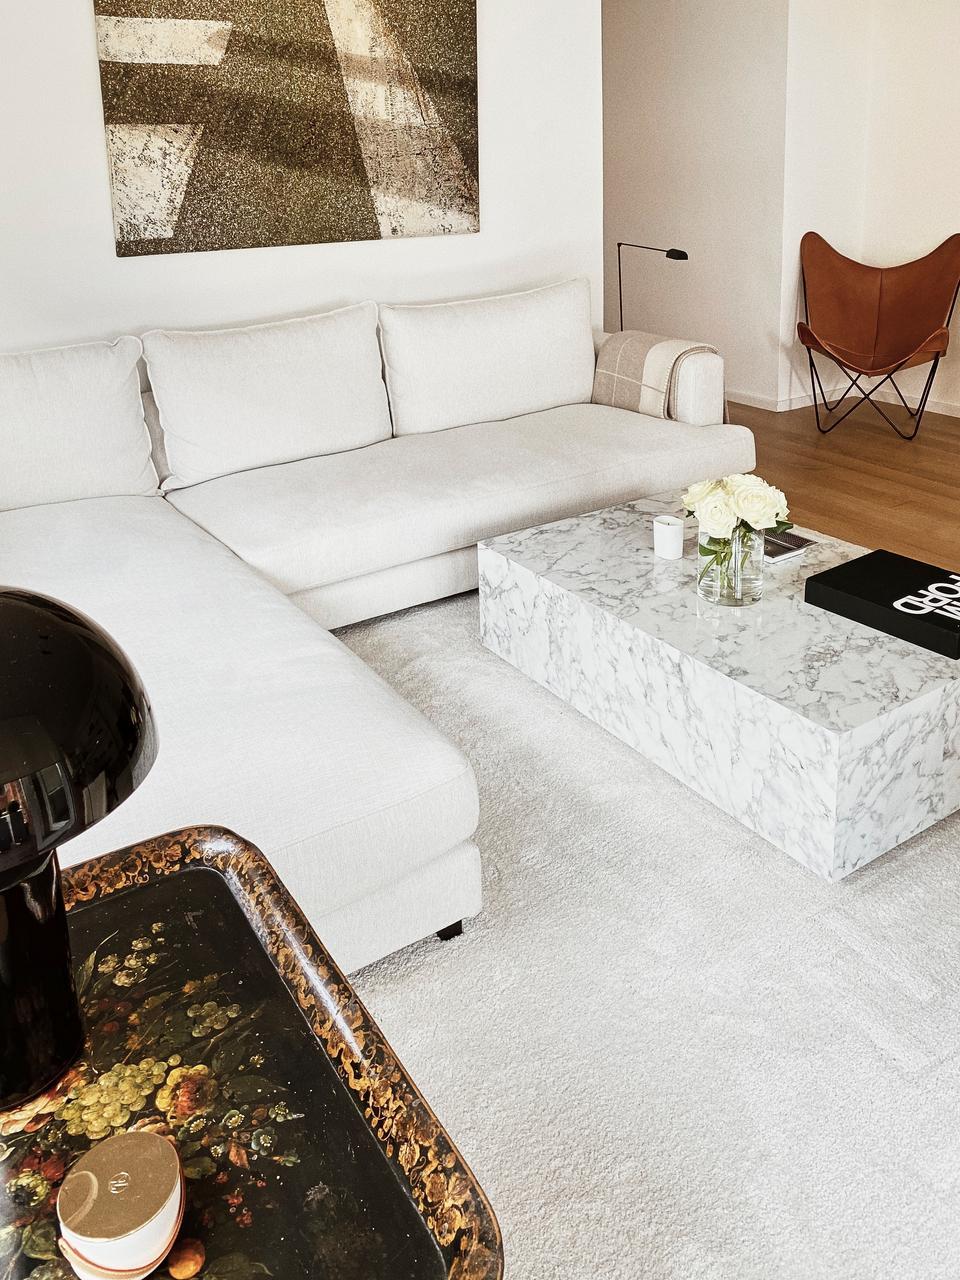 Zwevende salontafel Lesley met marmerlook, MDF bekleed met melaminefolie, Wit, gemarmerd, glanzend, 120 x 35 cm